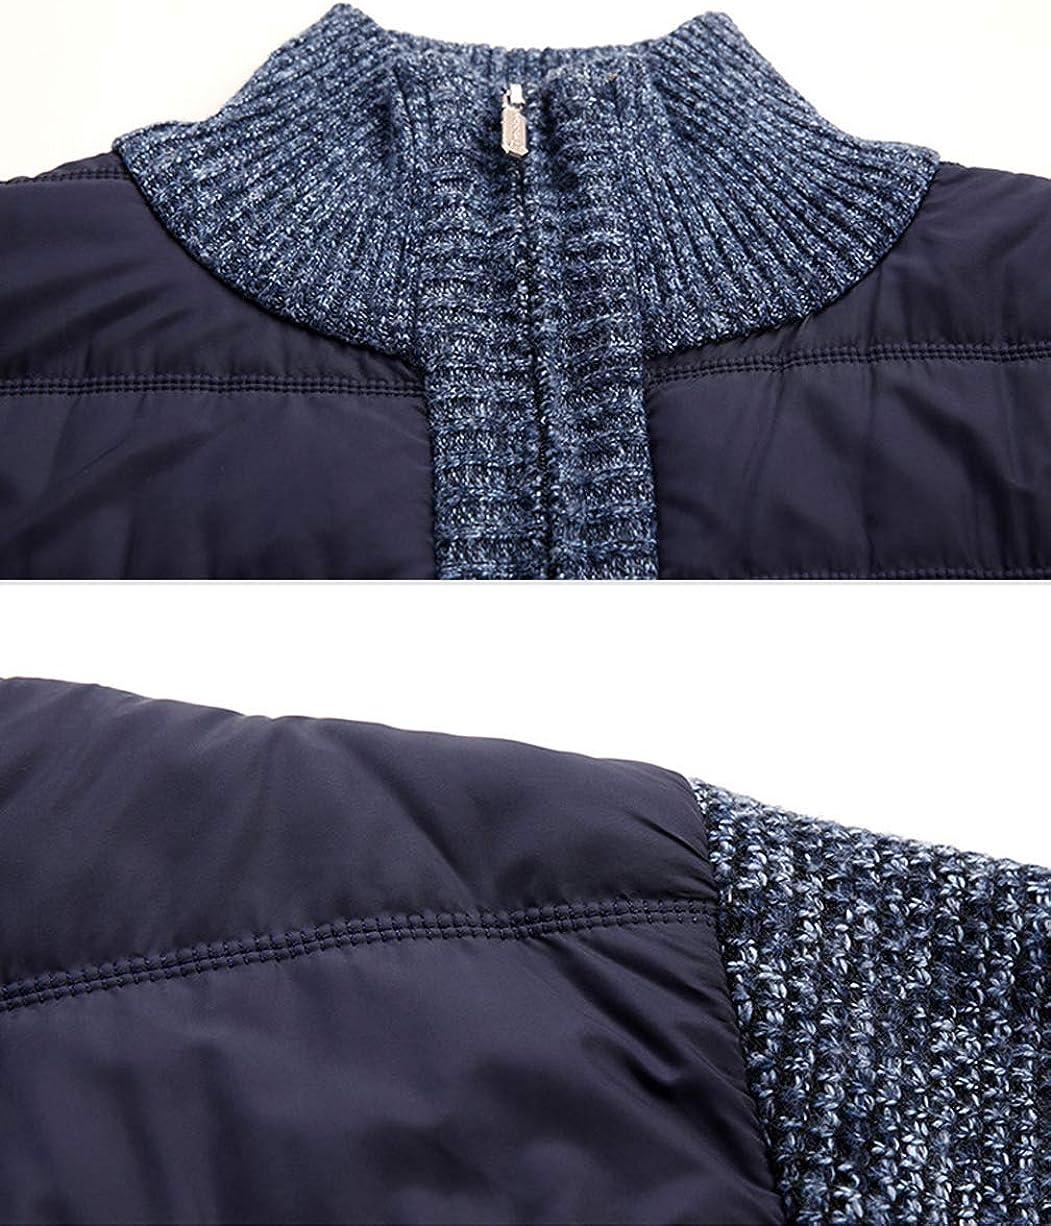 Mans Stylish Camouflage Fleece Lined Patchwork Knitwear Jacket Cardigan Coat